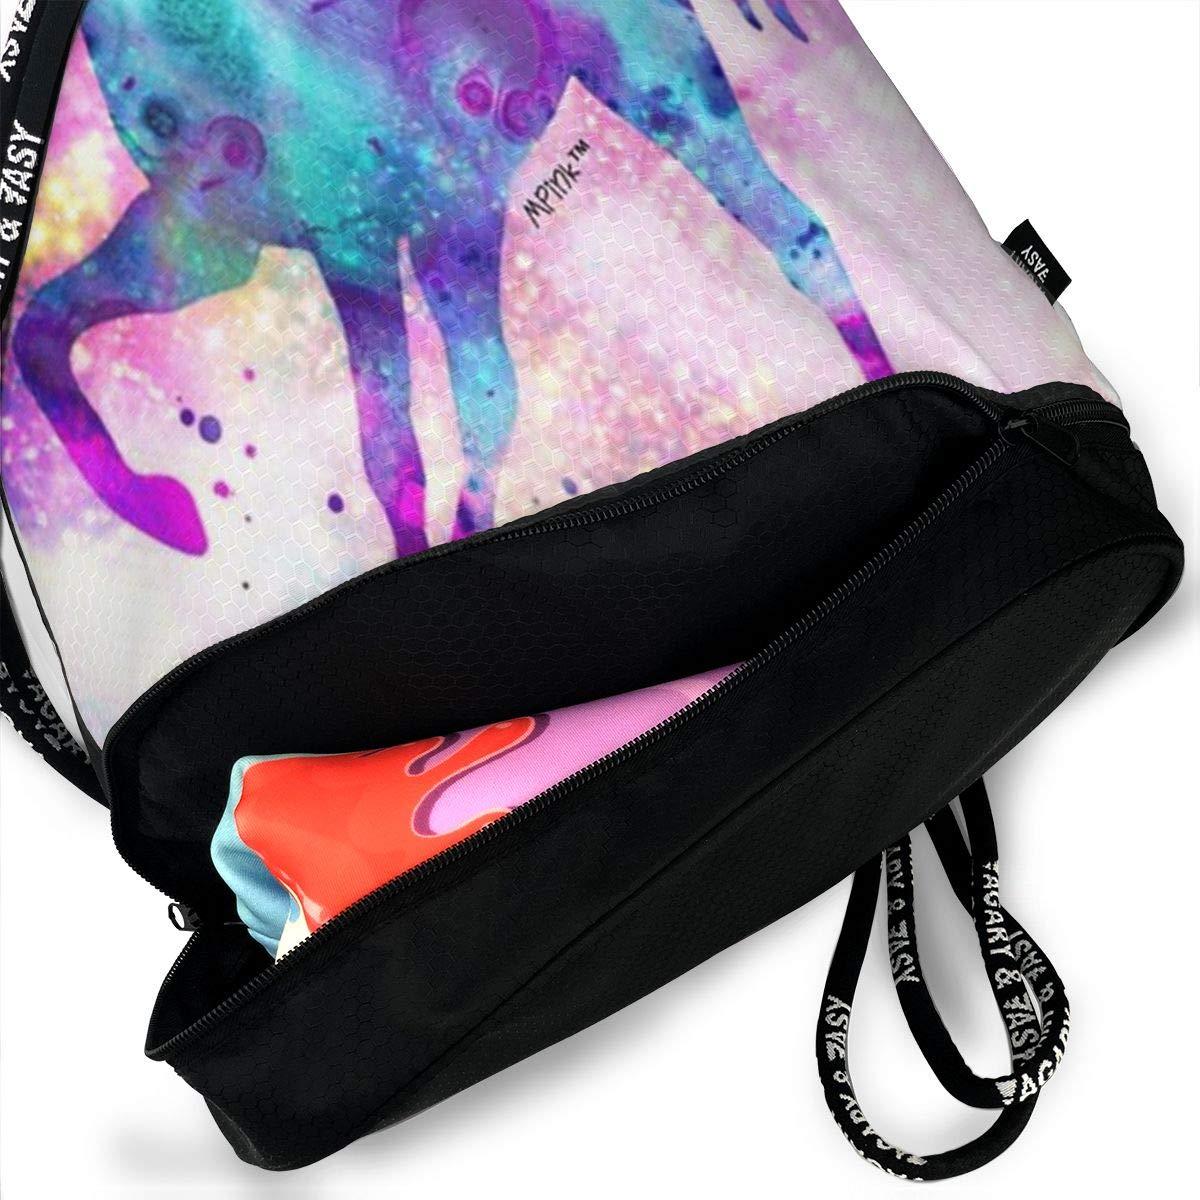 HUOPR5Q Rainbow Unicorn Drawstring Backpack Sport Gym Sack Shoulder Bulk Bag Dance Bag for School Travel